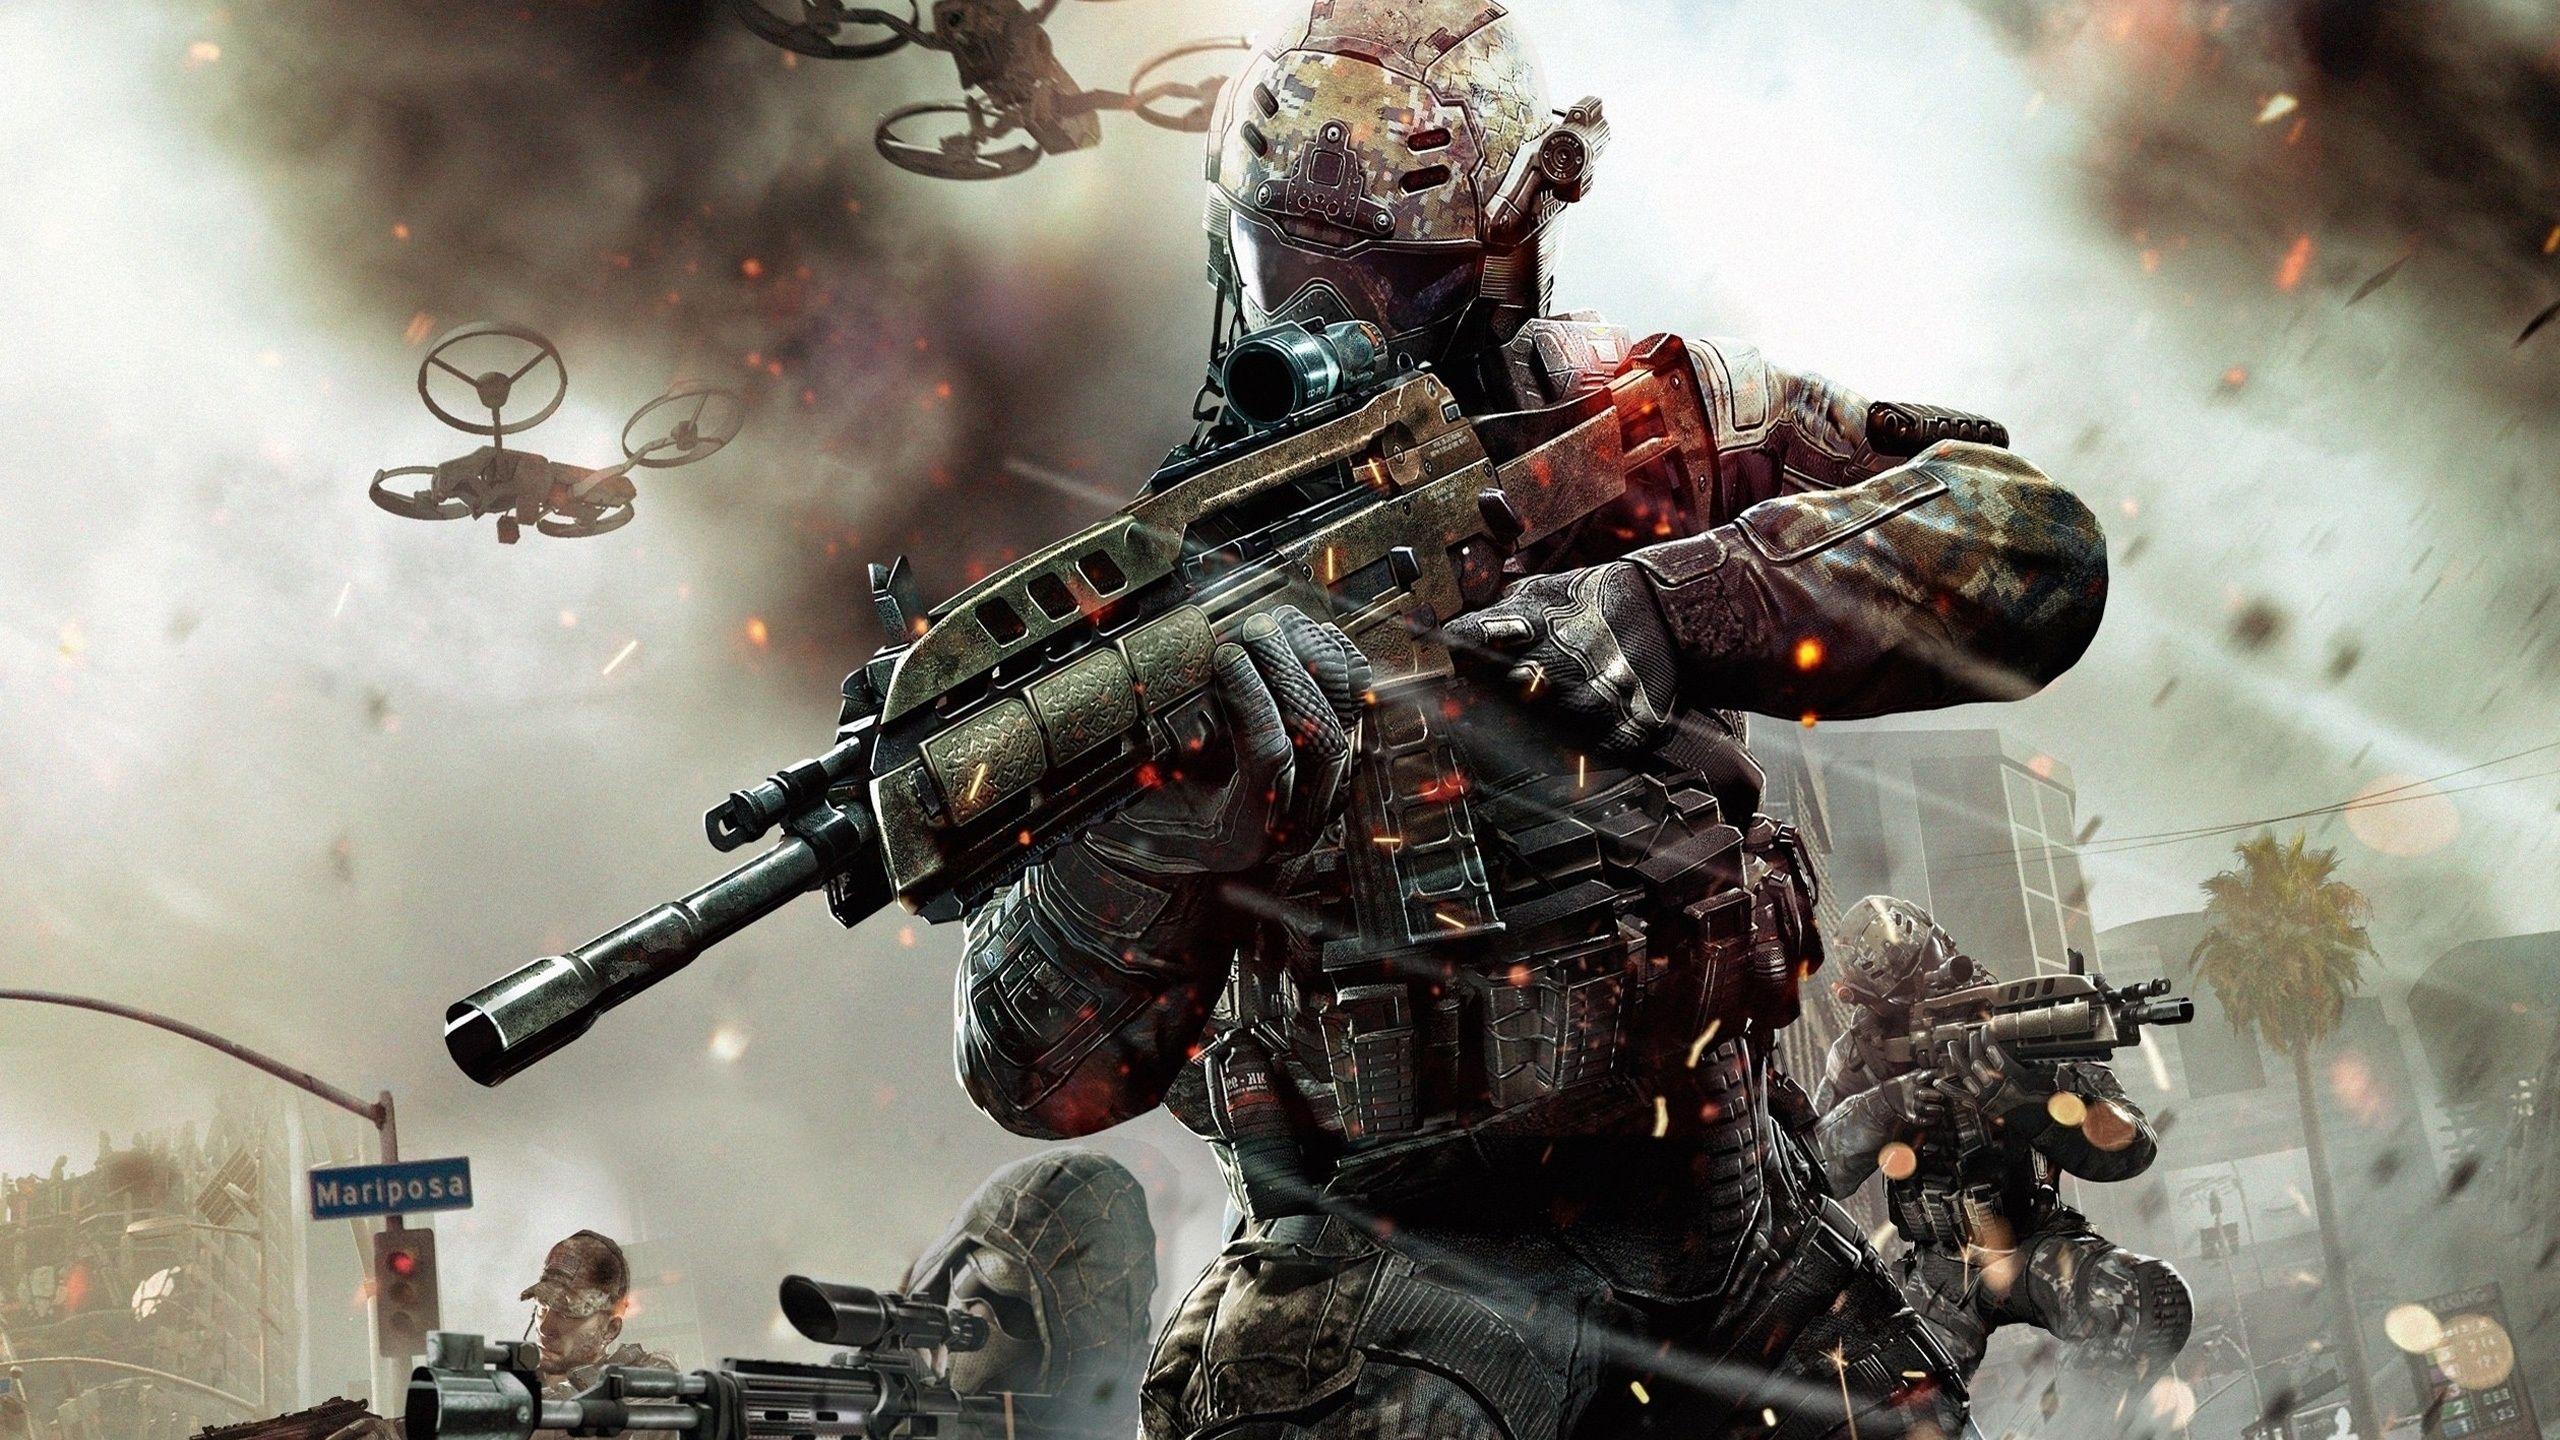 Call Of Duty Black Ops Ii 3 Mac Wallpaper Gggg Pinterest Call